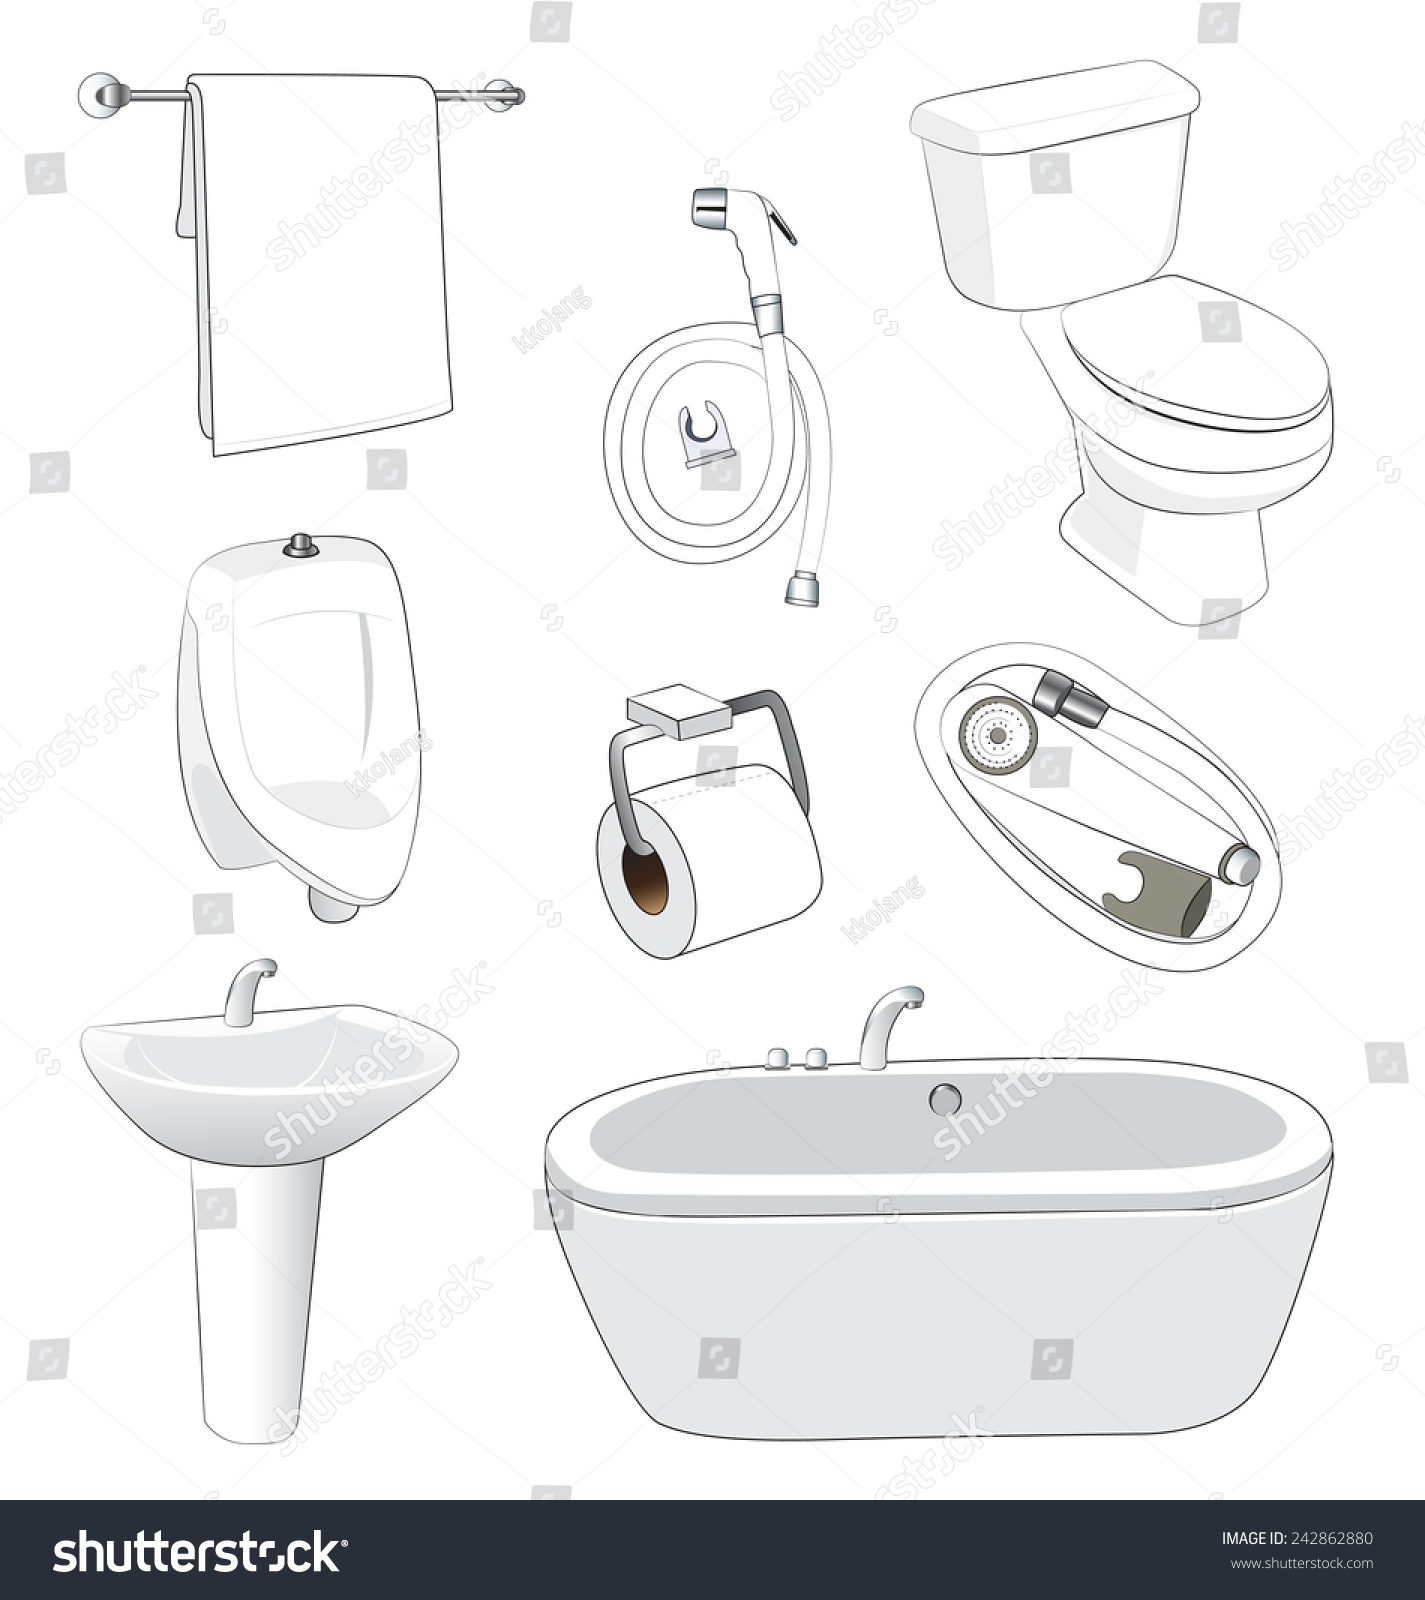 Sanitary Ware Bathroom On White Background Stock Vector 242862880 ...